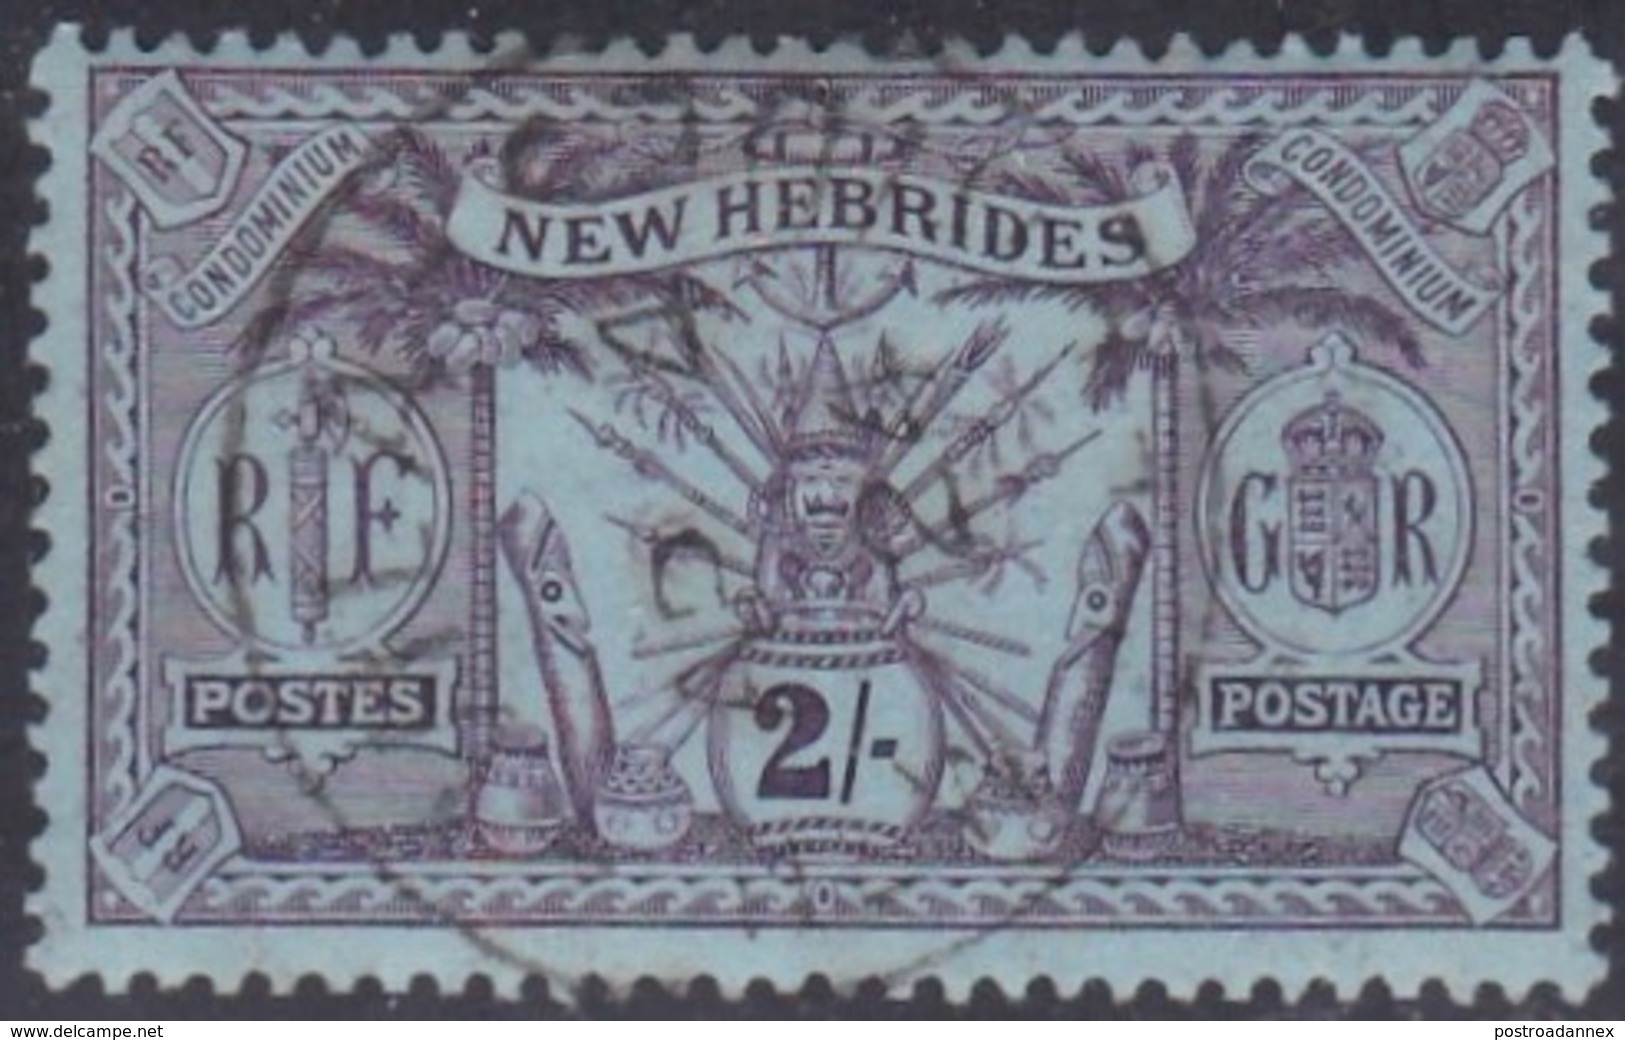 New Hebrides, Scott #24, Used, Idol, Issued 1911 - English Legend